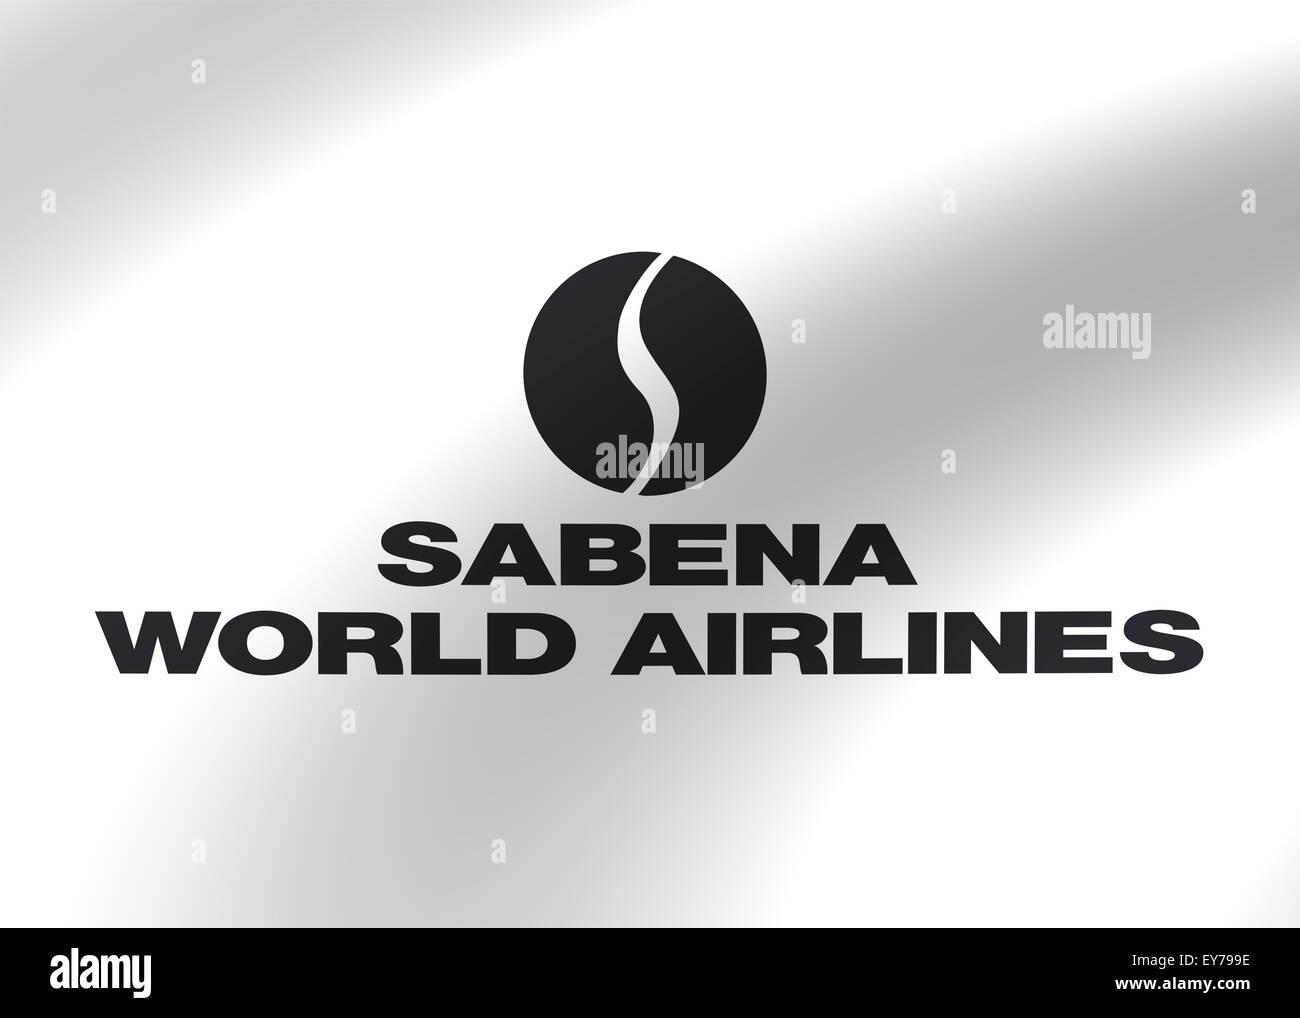 Sabena Airlines logo icon flag emblem sign Stock Photo